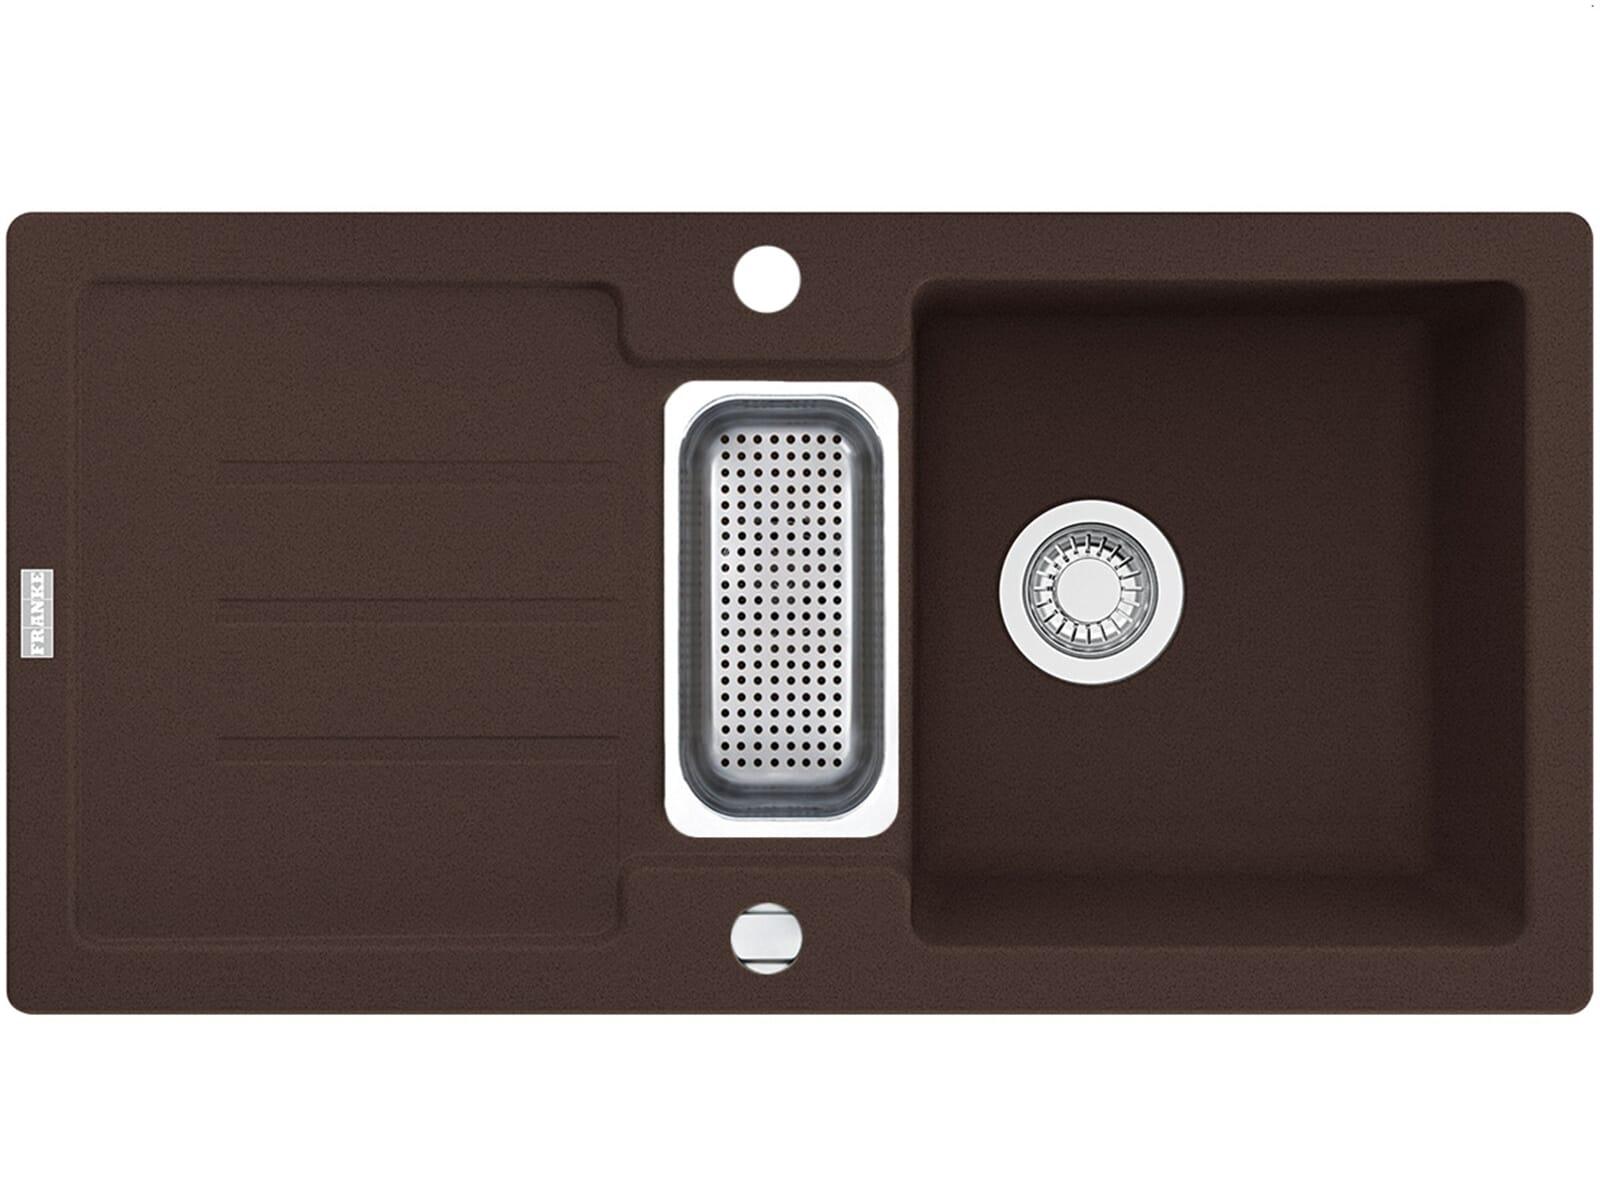 Franke Strata STG 651-86 Chocolate Granitspüle